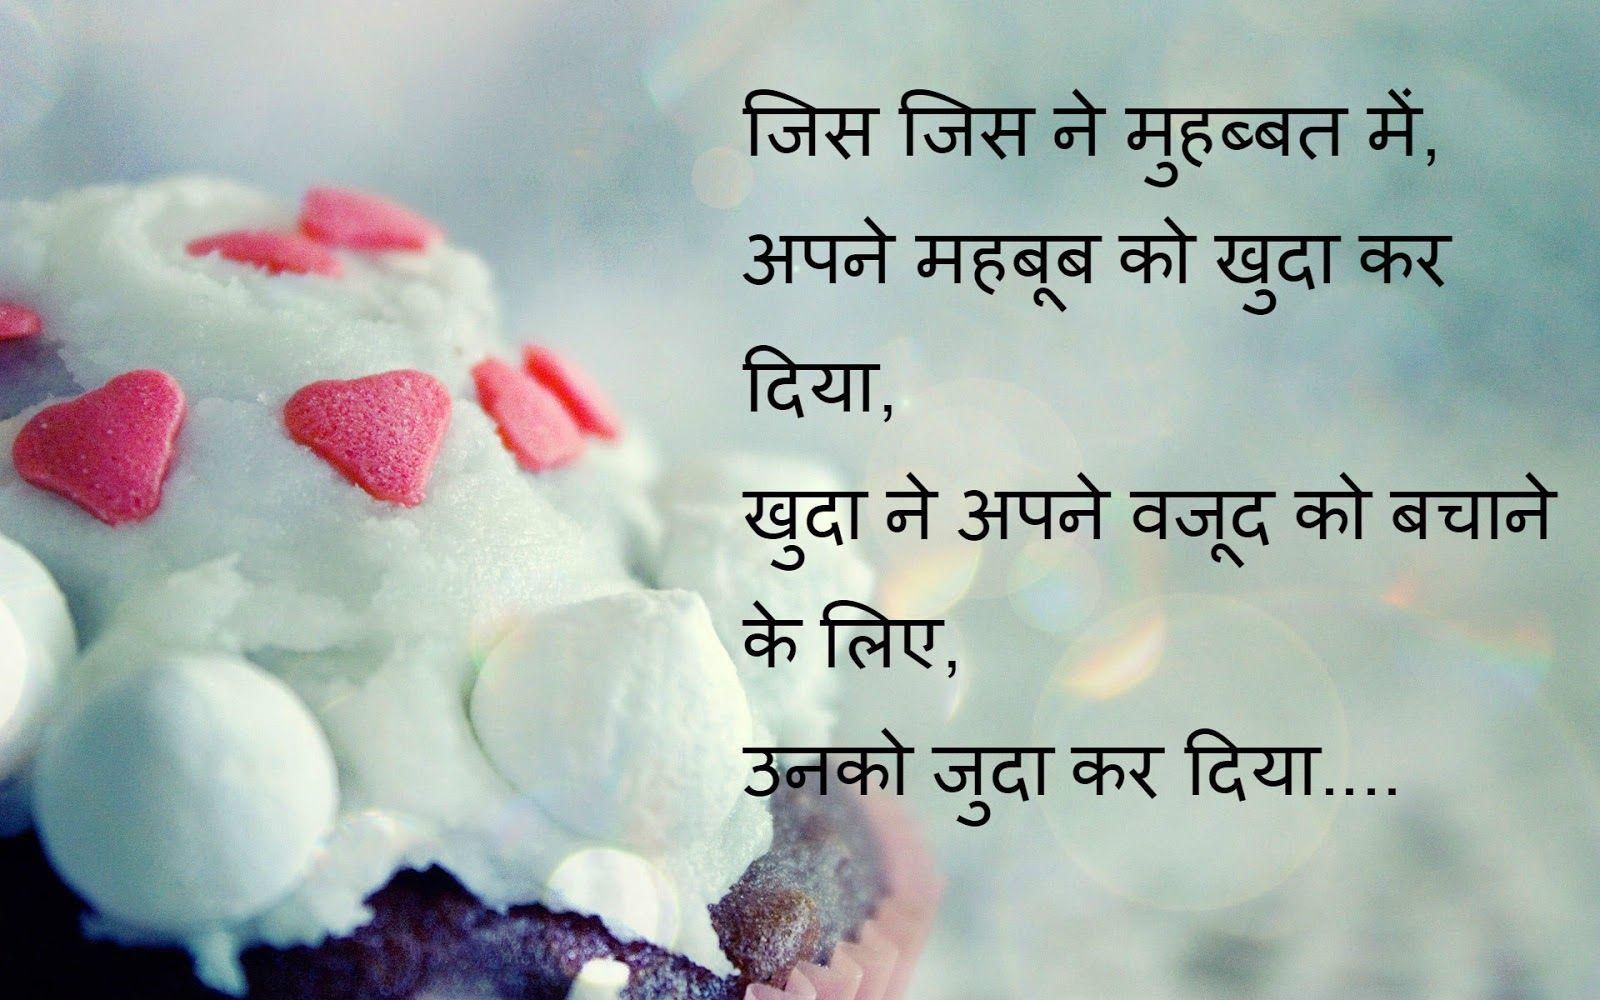 Good Wallpaper Love Hindi - 9d07a1d69d1b15fbecf855f5202a8c4d  Photograph_44893.jpg